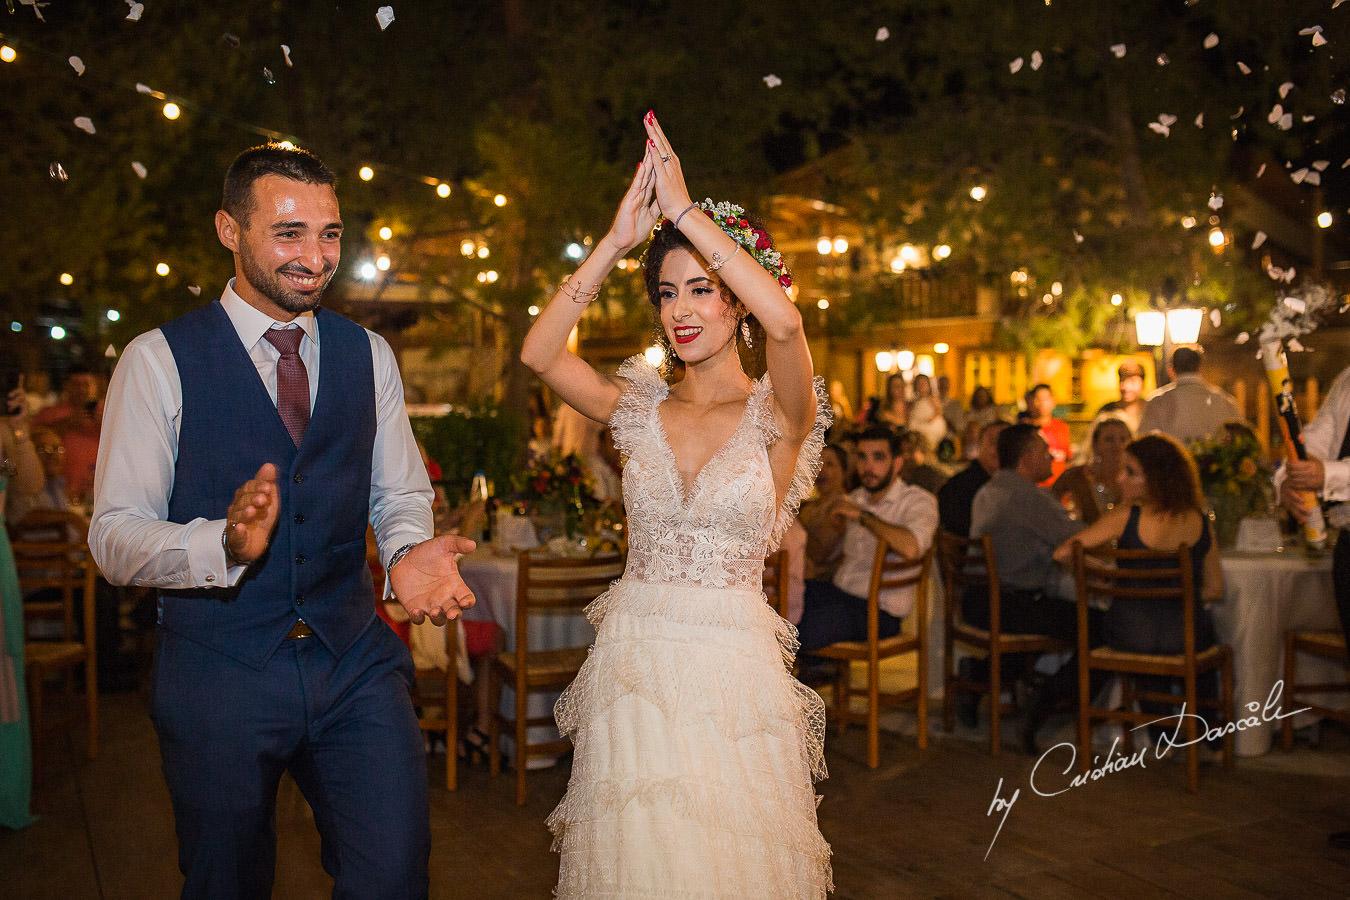 Moments captured by Cyprus Wedding Photographer Cristian Dascalu at a beautiful wedding in Larnaka, Cyprus.